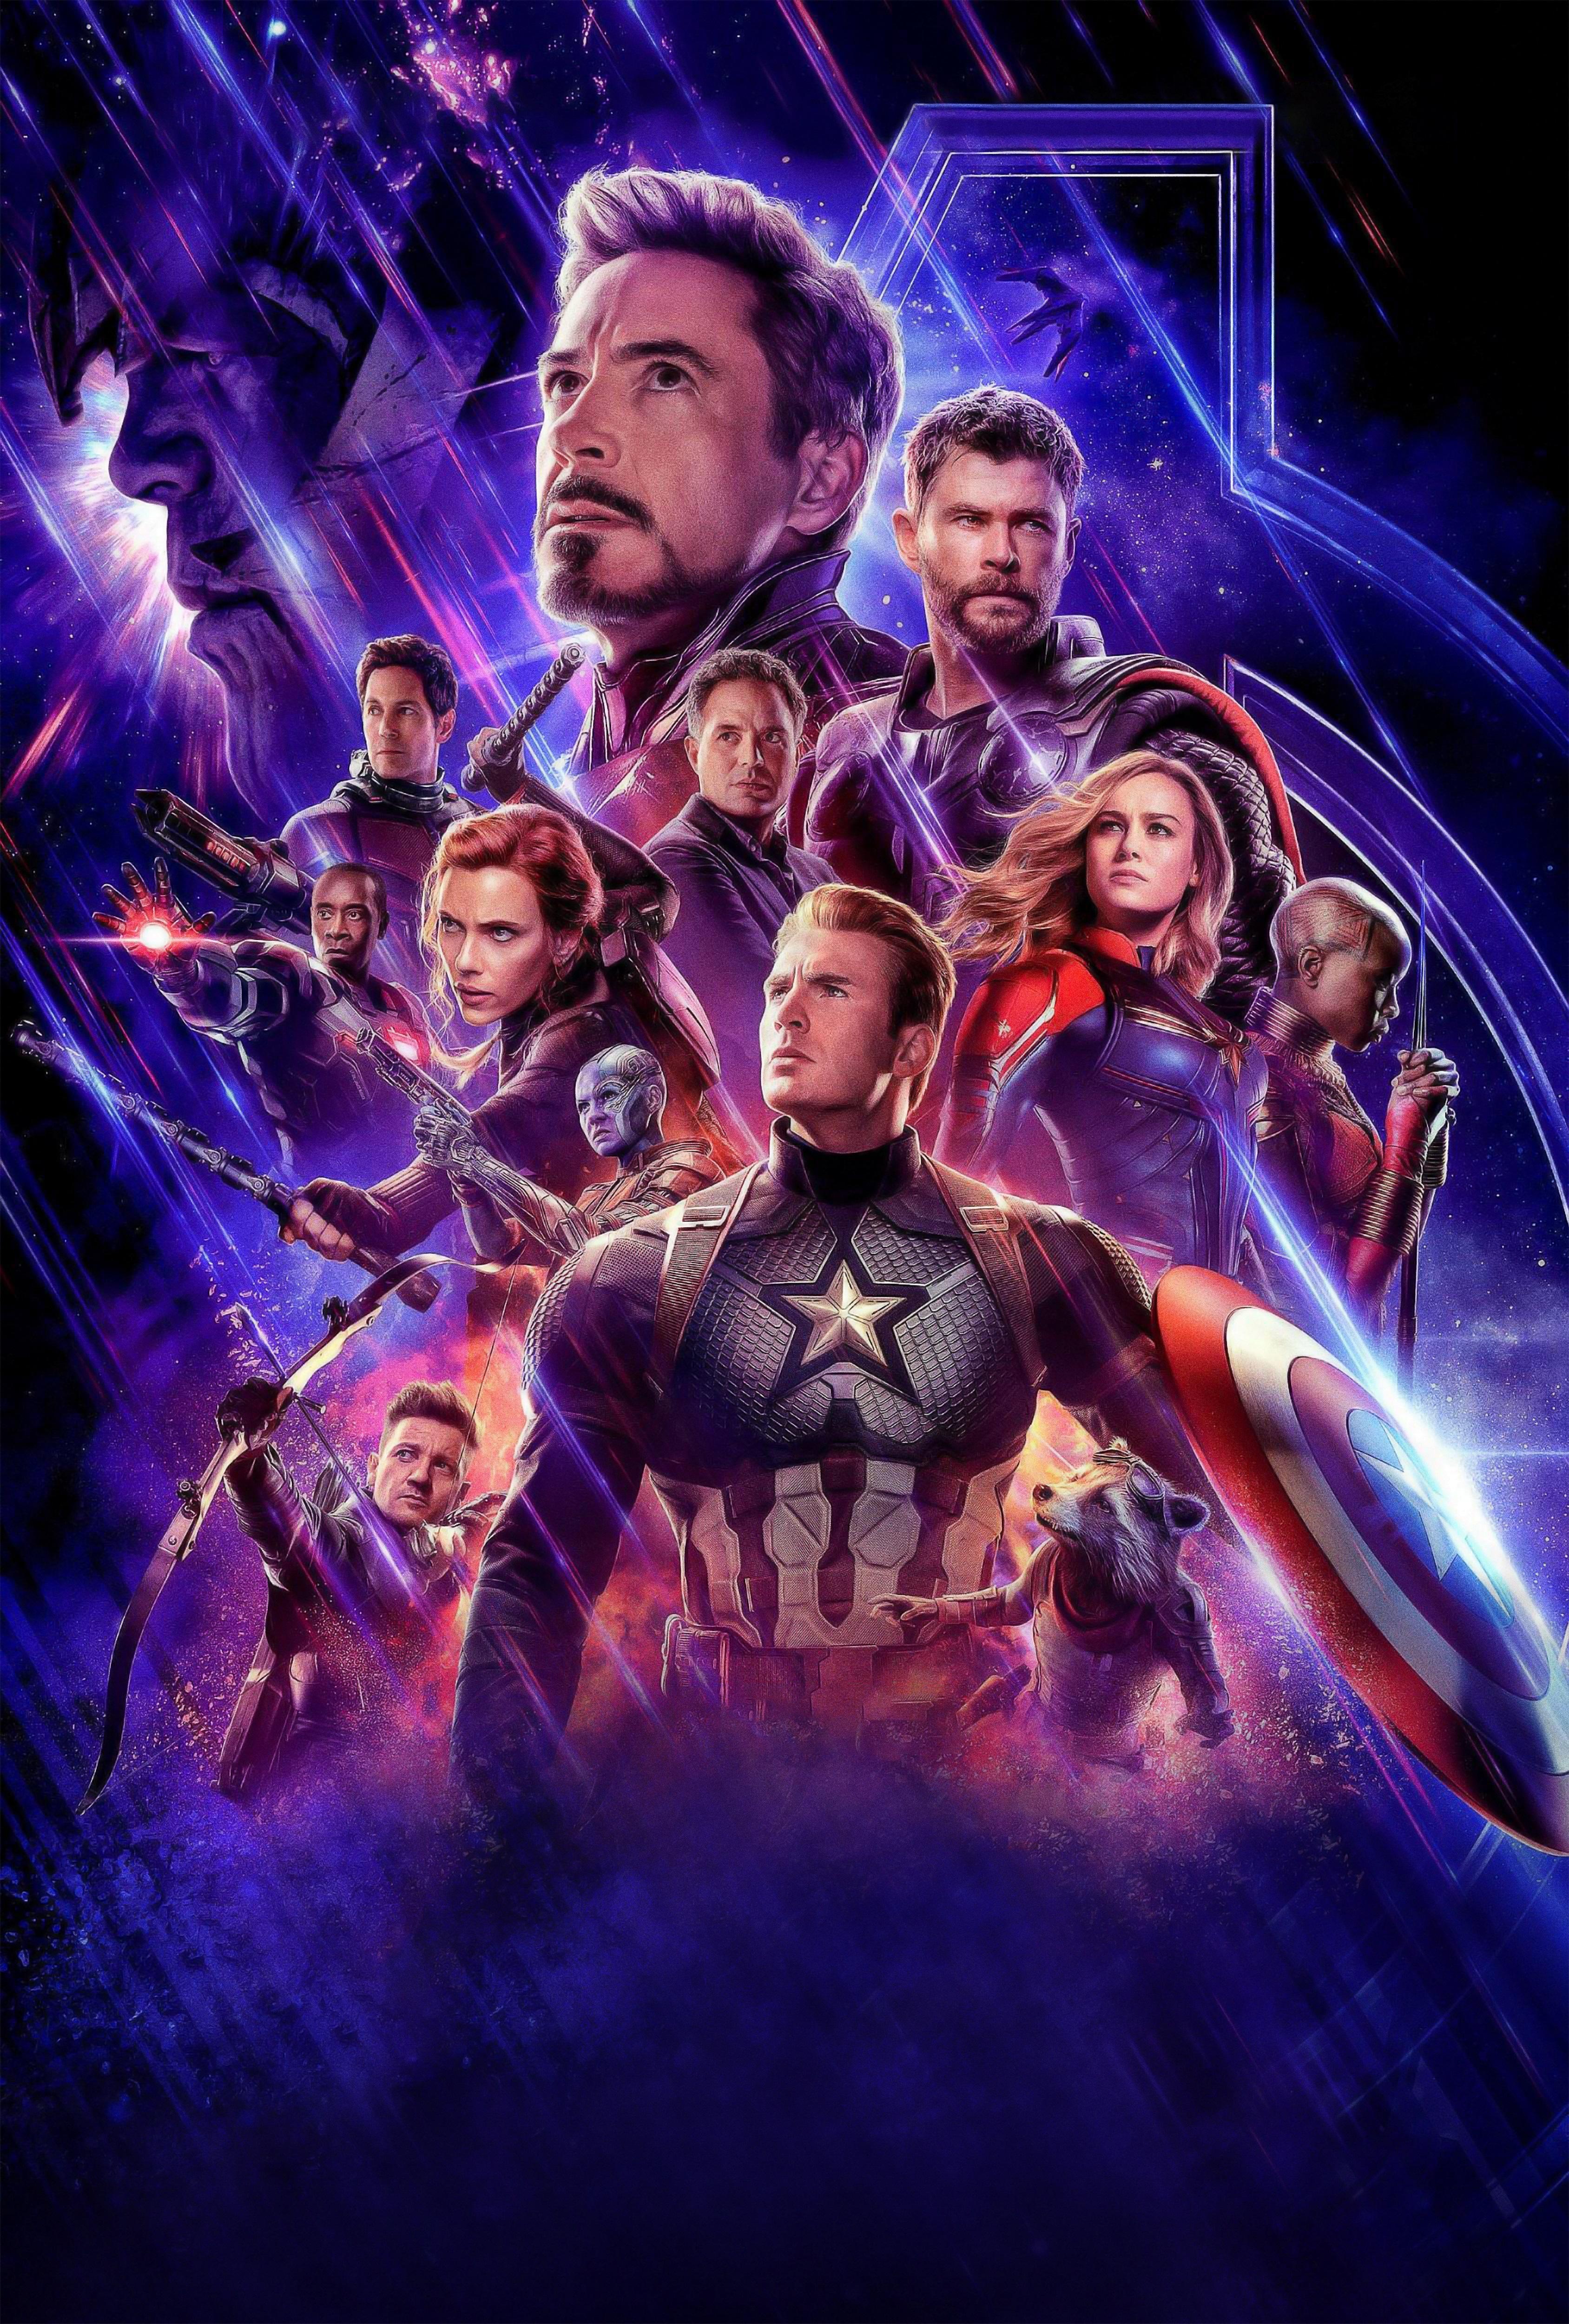 Avengers Endgame Official Poster Wallpaper, HD Movies 4K ...